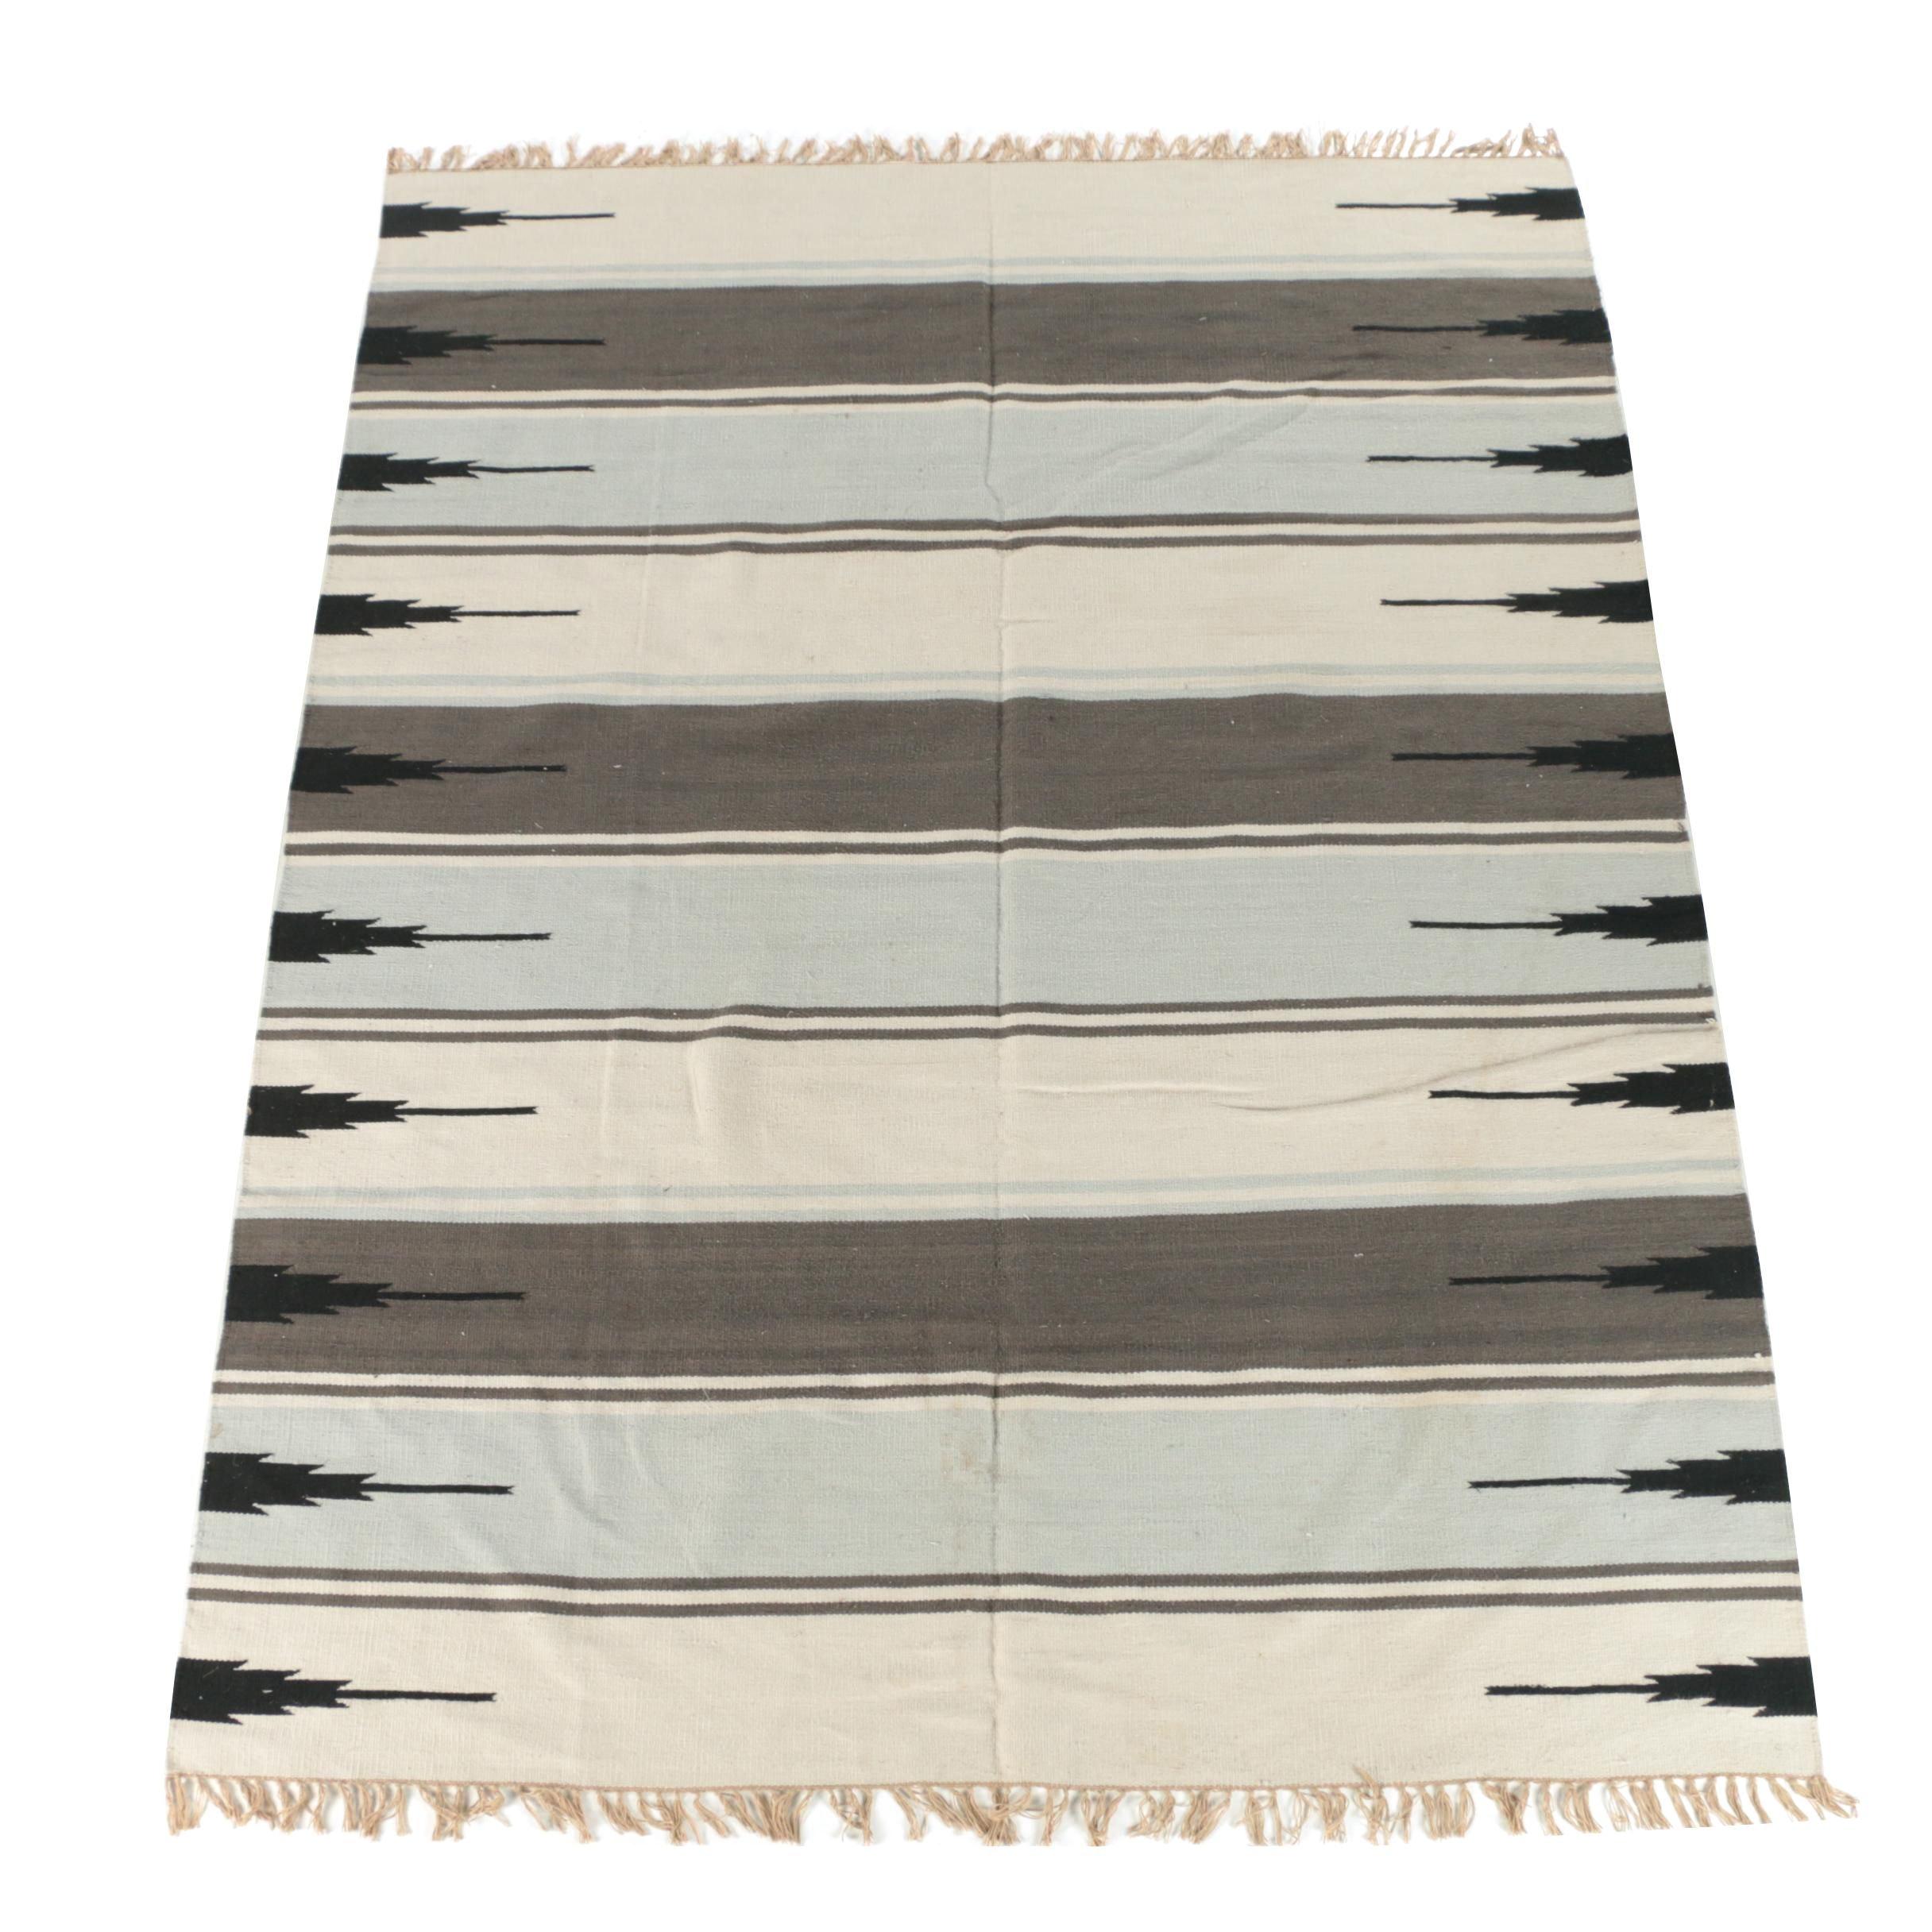 Handwoven Mexican Zapotec Style Area Rug